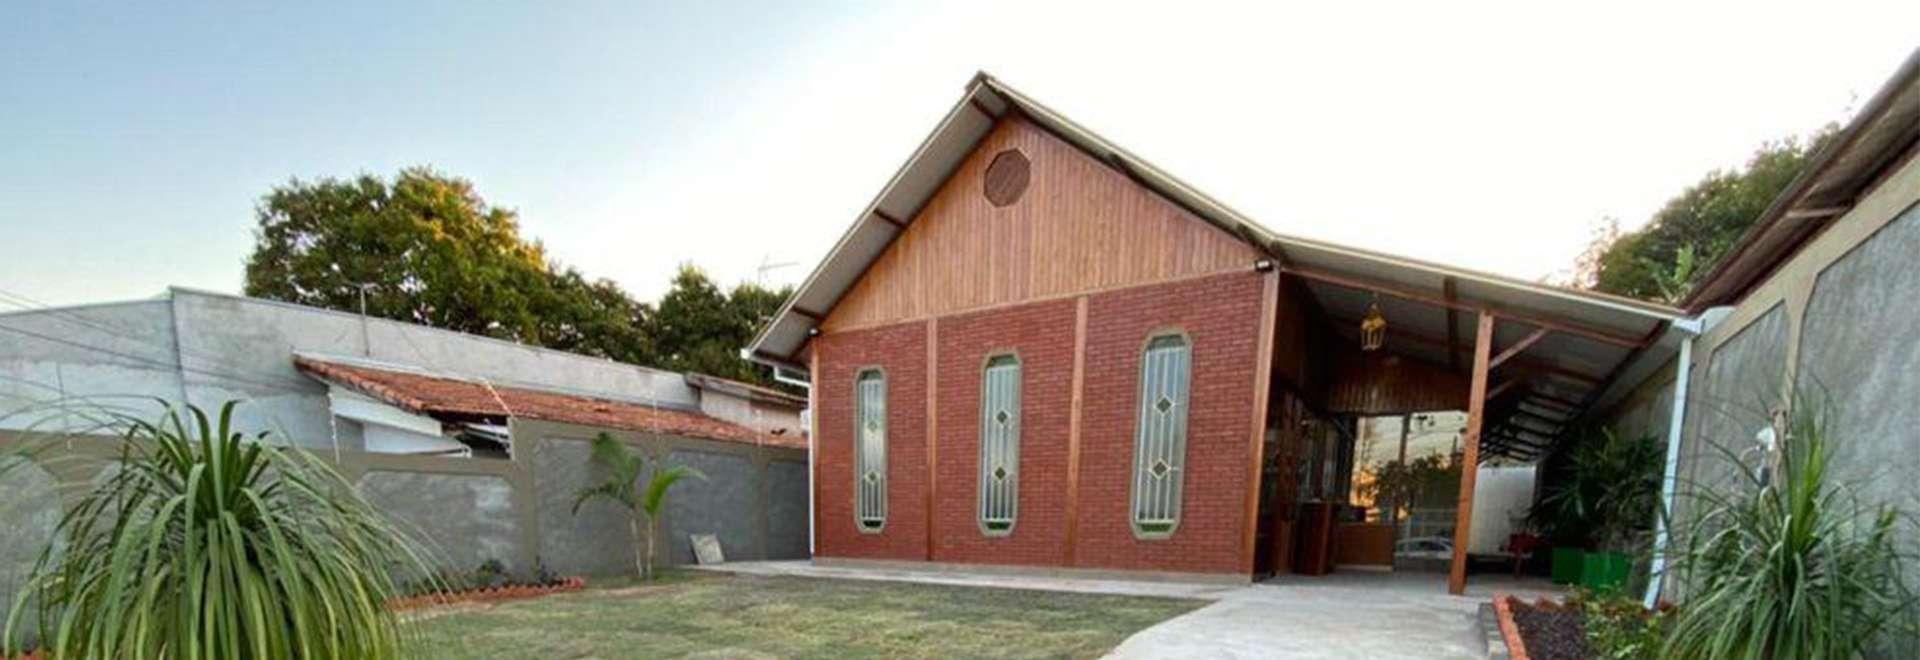 Igreja Cristã Maranata consagra novos templos no Brasil